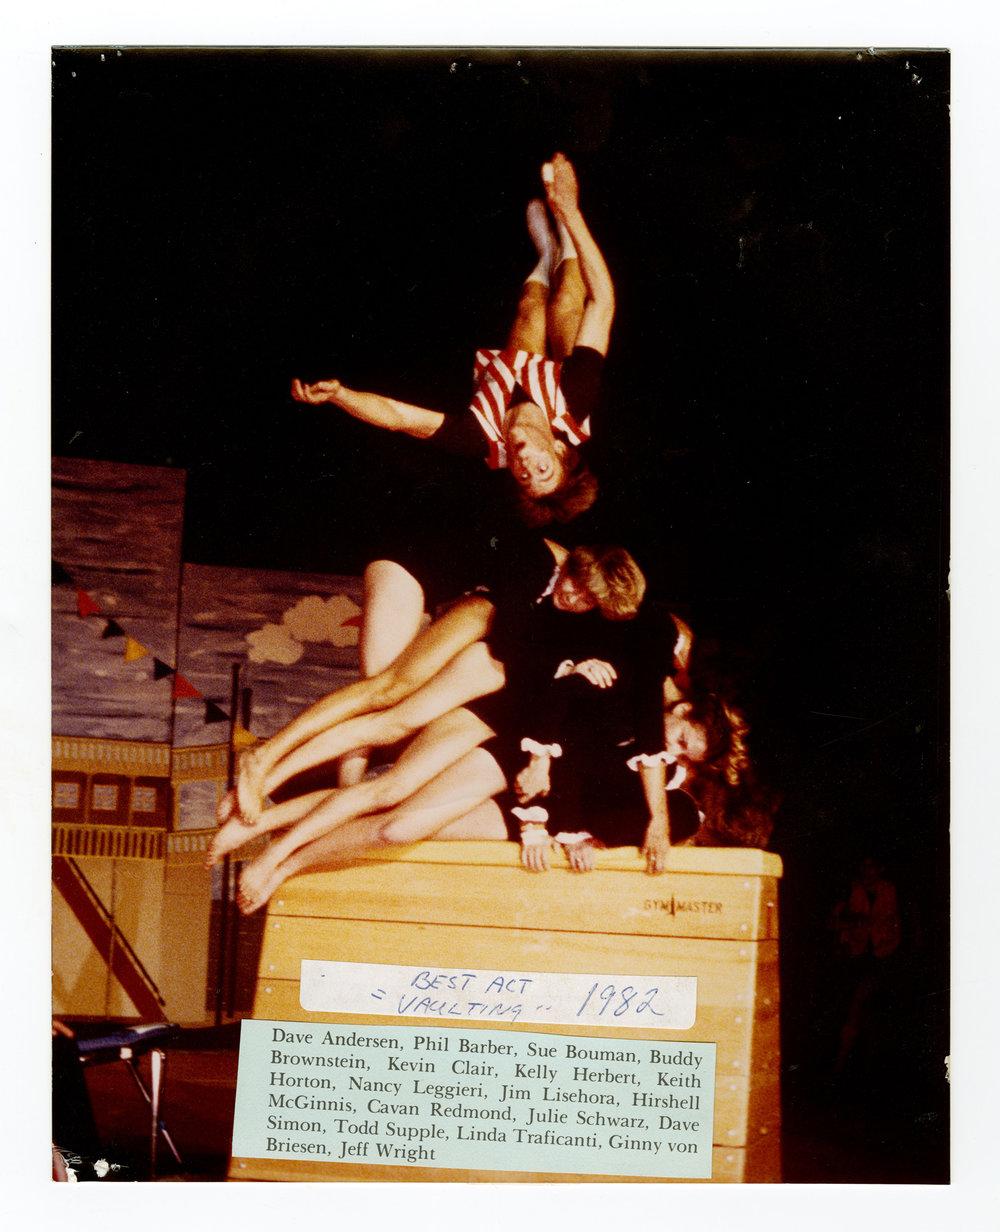 1982 - Vaulting